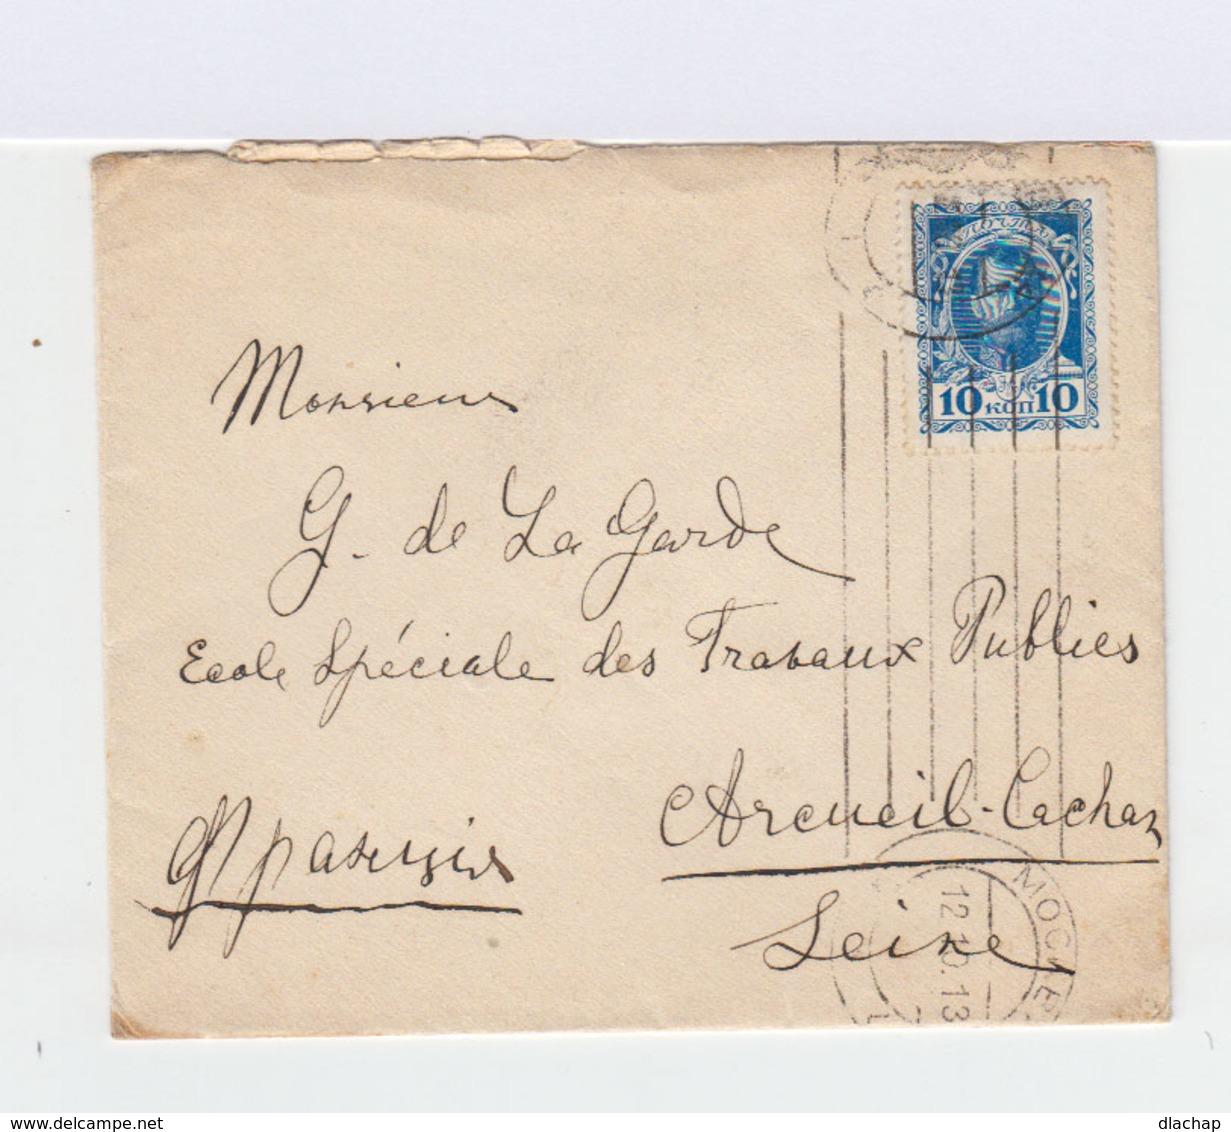 Enveloppe De Moscou à Arcueil Cachan. Timbre Nicolas II 10 K. Bleu CAD Mockba 1913 Et Lignes. (798) - 1857-1916 Empire